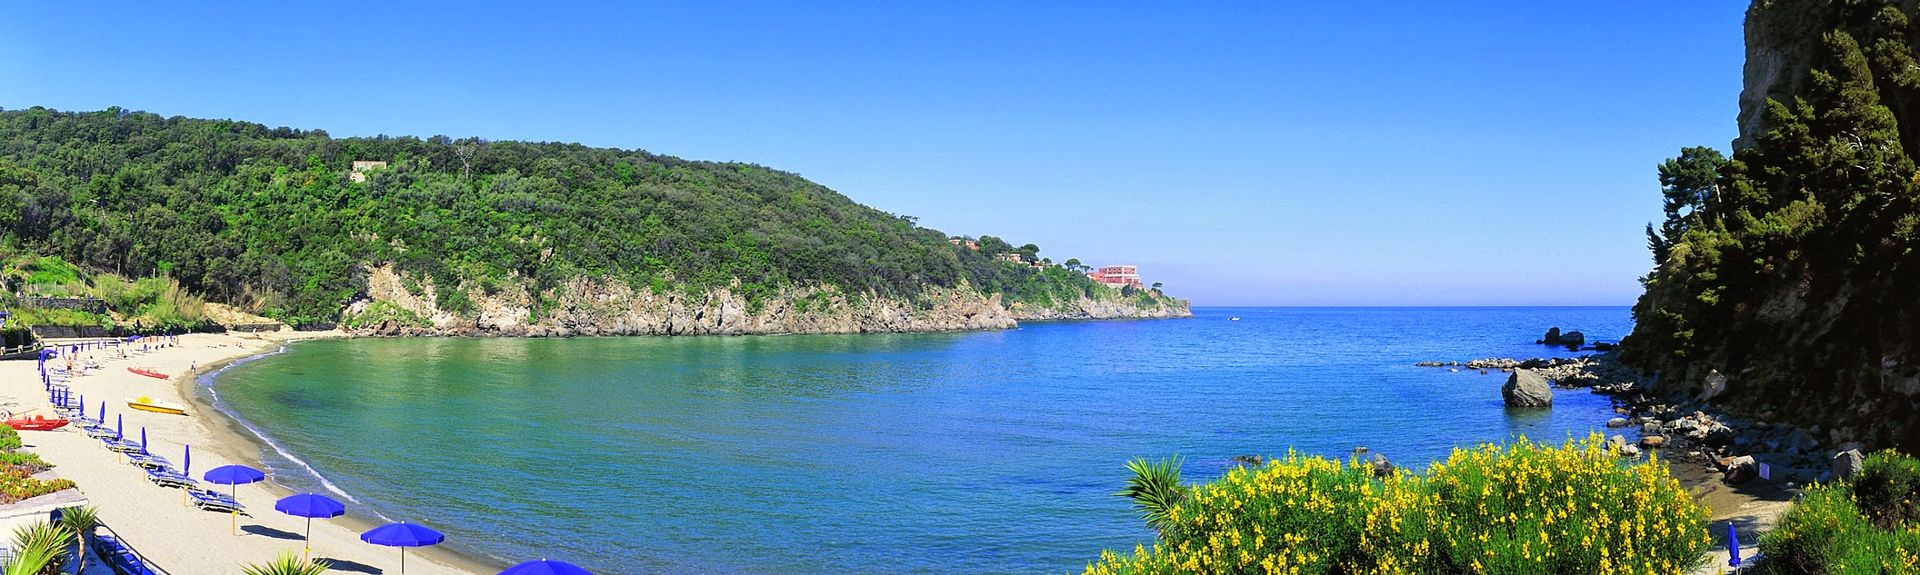 Club de golf Volturno, Castel Volturno, Campania, Italia